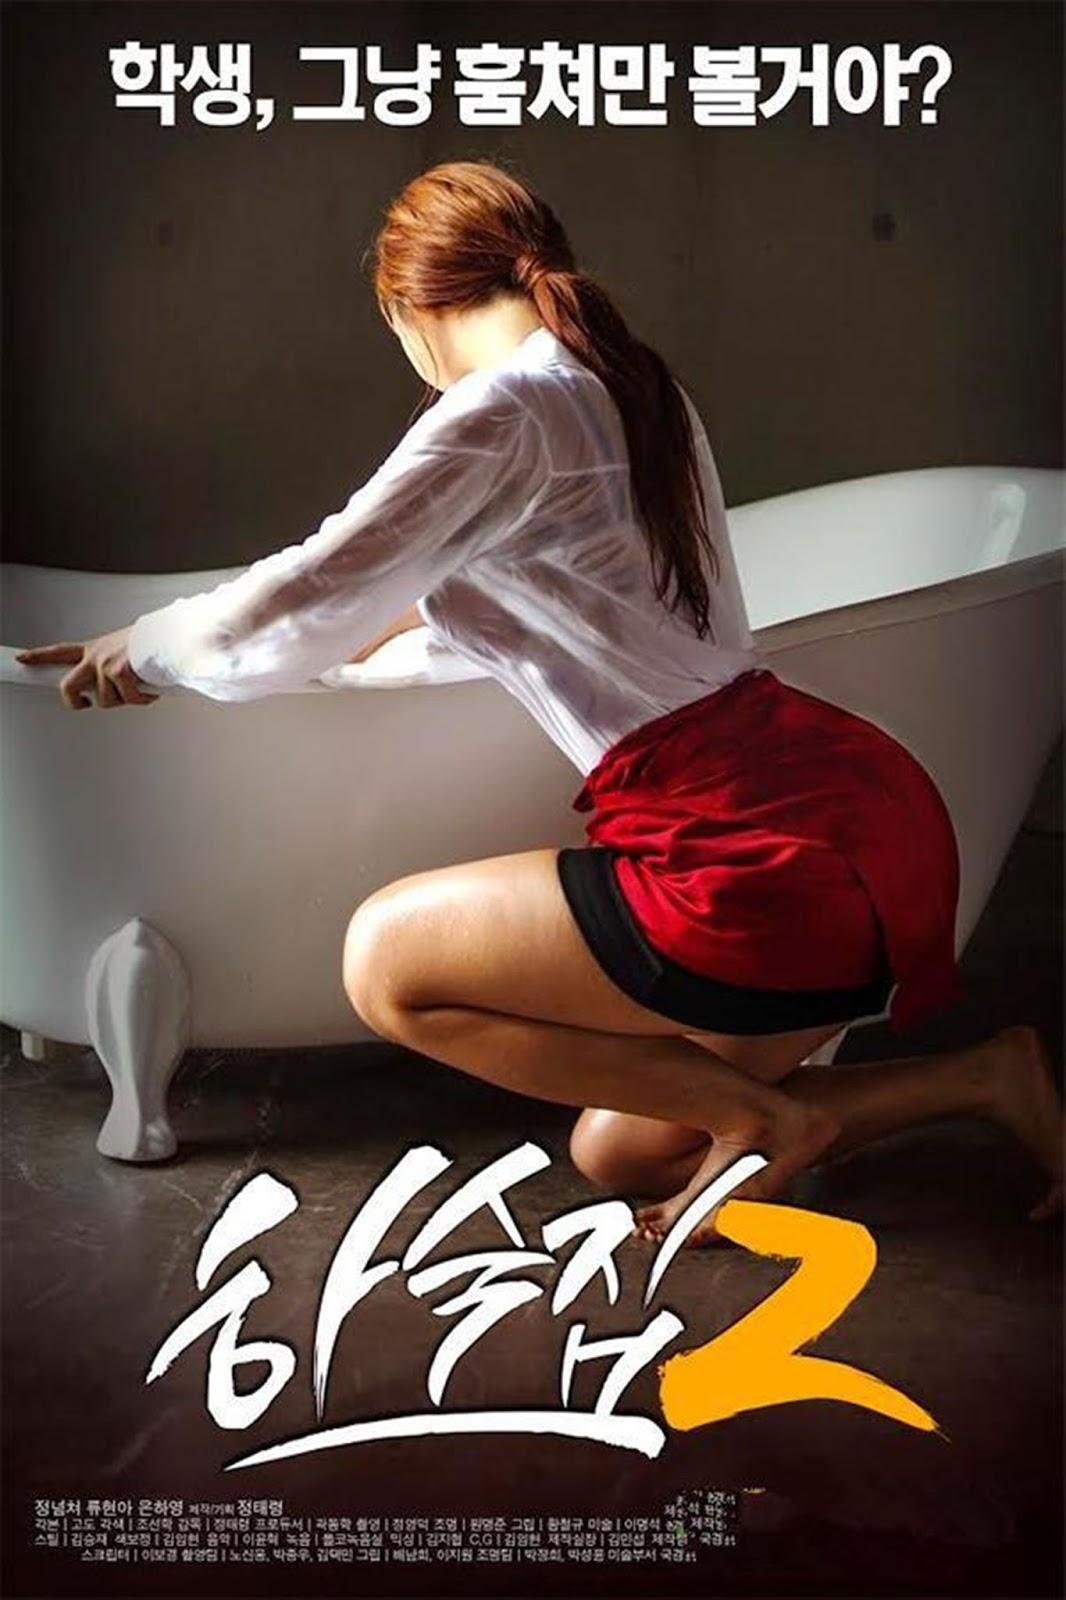 3d anime sikiеџ video izle xxx video